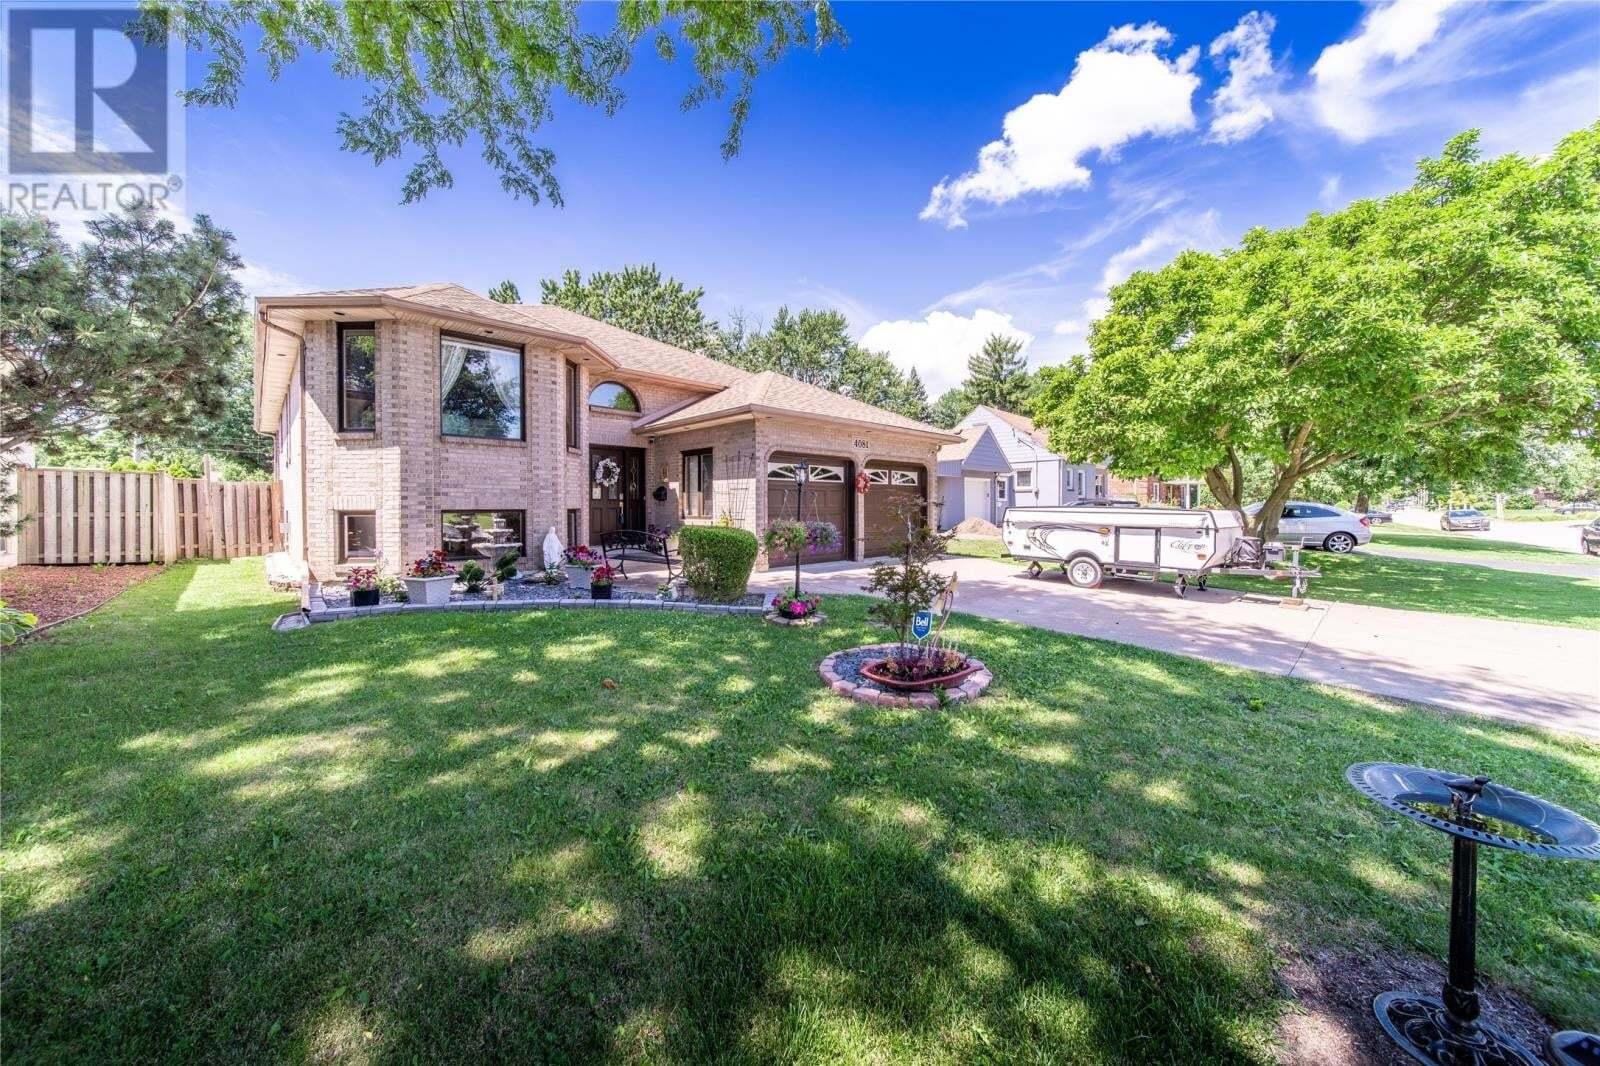 House for sale at 4081 Casgrain  Windsor Ontario - MLS: 20009602